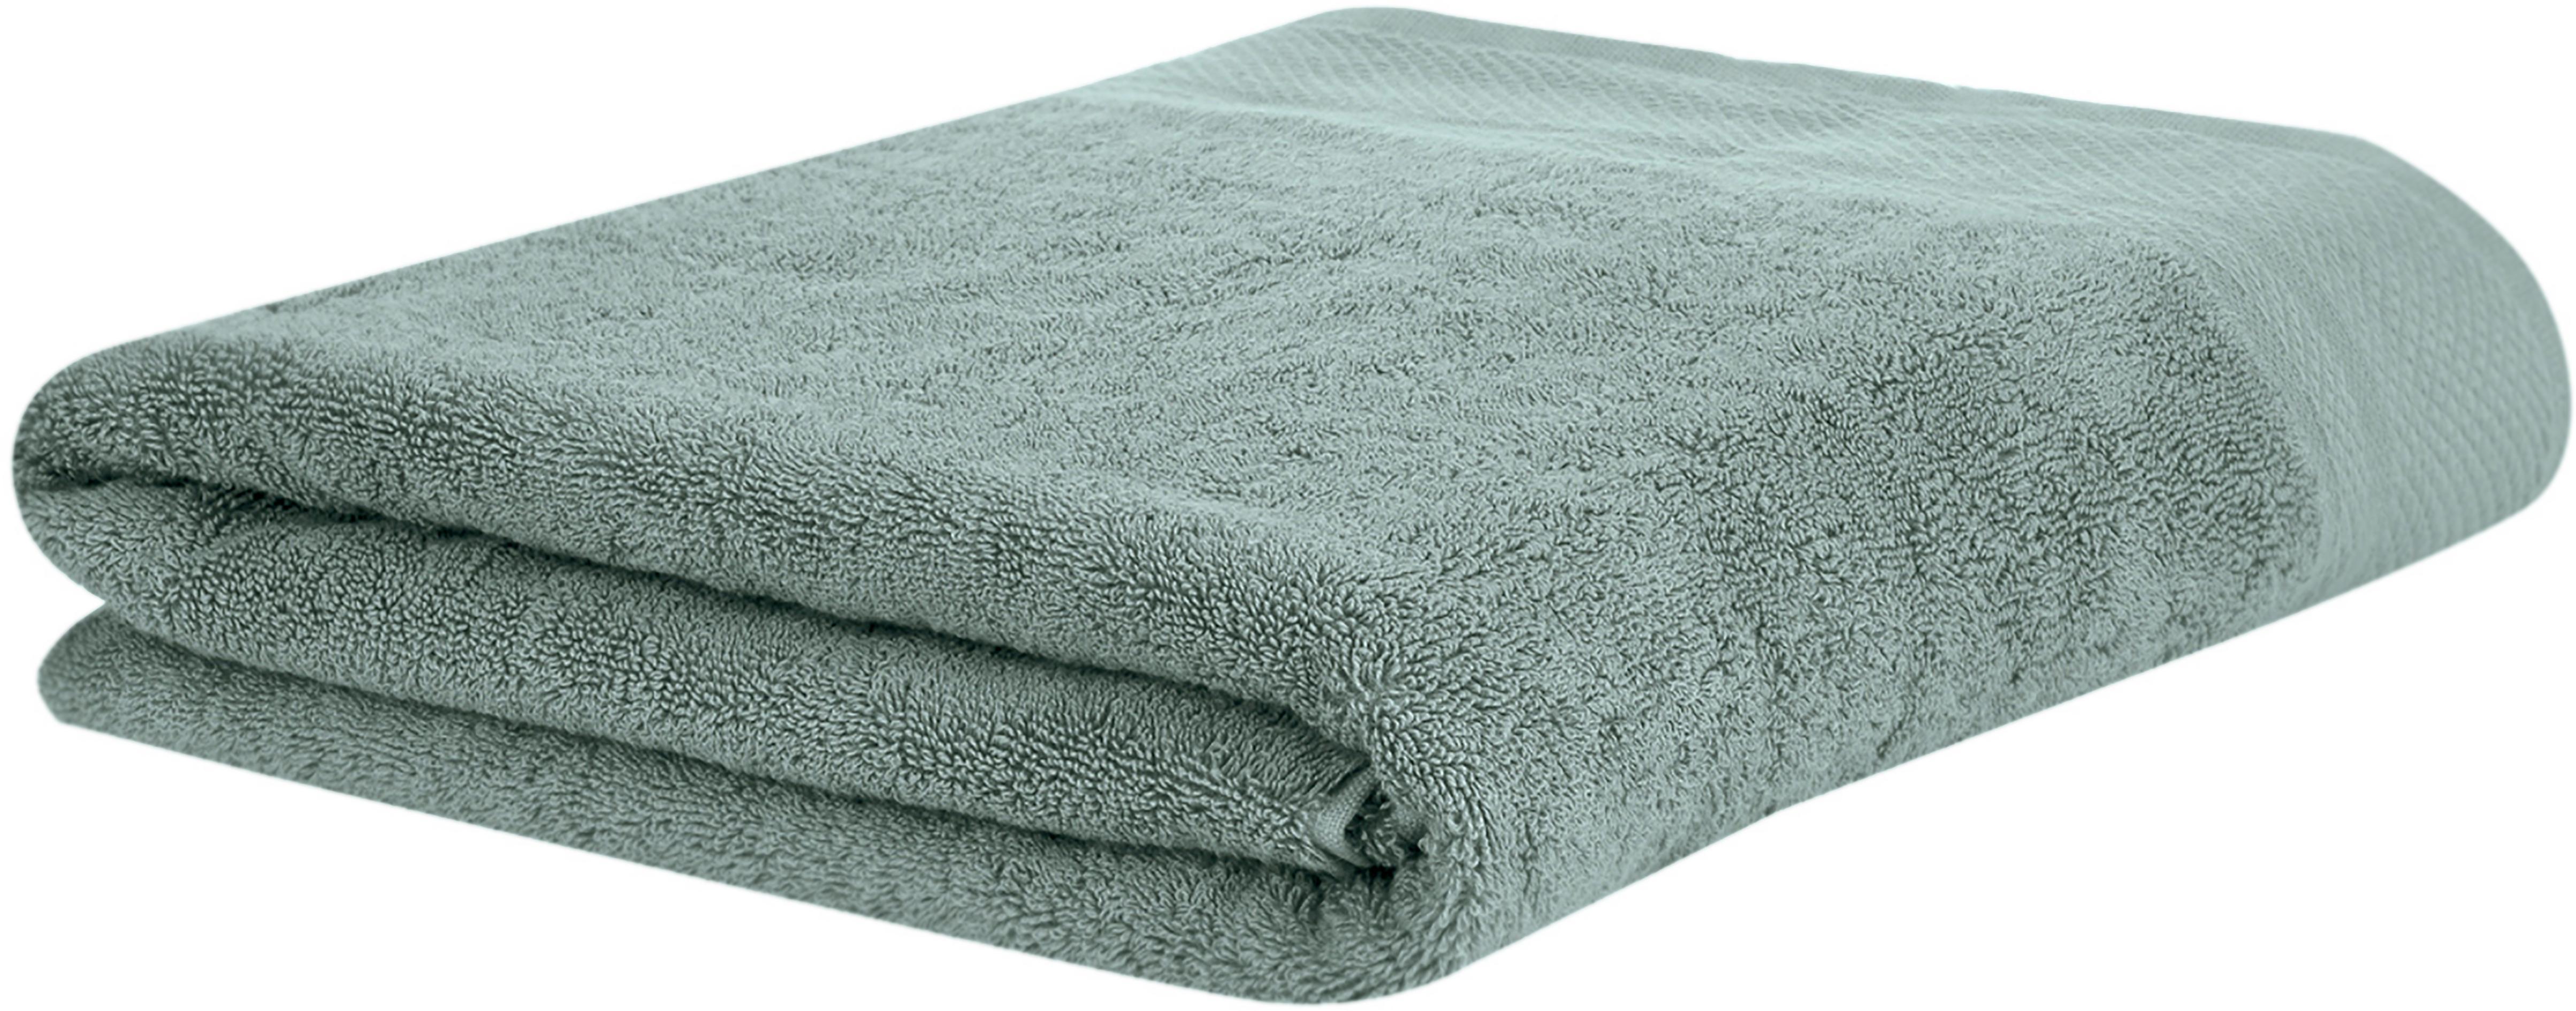 Asciugamano con bordo decorativo Premium, diverse misure, Verde salvia, Asciugamano